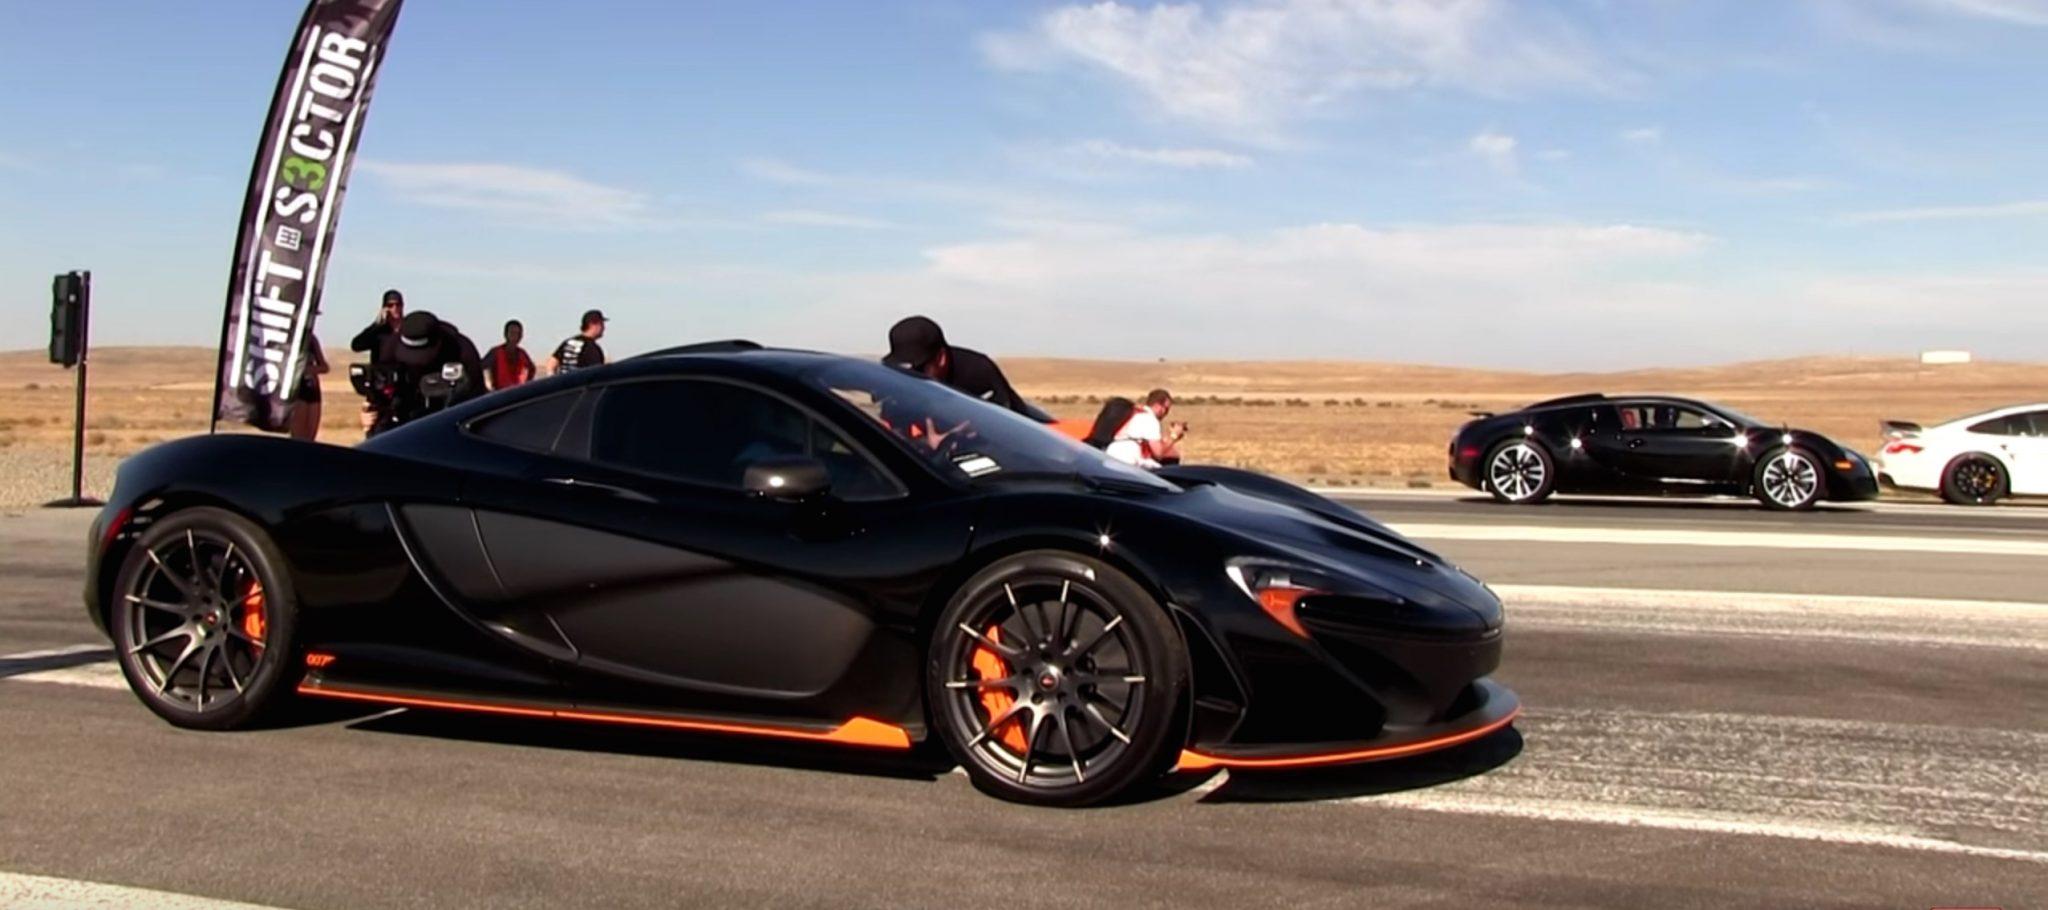 bugatti-veyron-vs-mclaren-p1-drag-race Inspiring Bugatti Veyron Vs Lamborghini Gallardo Cars Trend